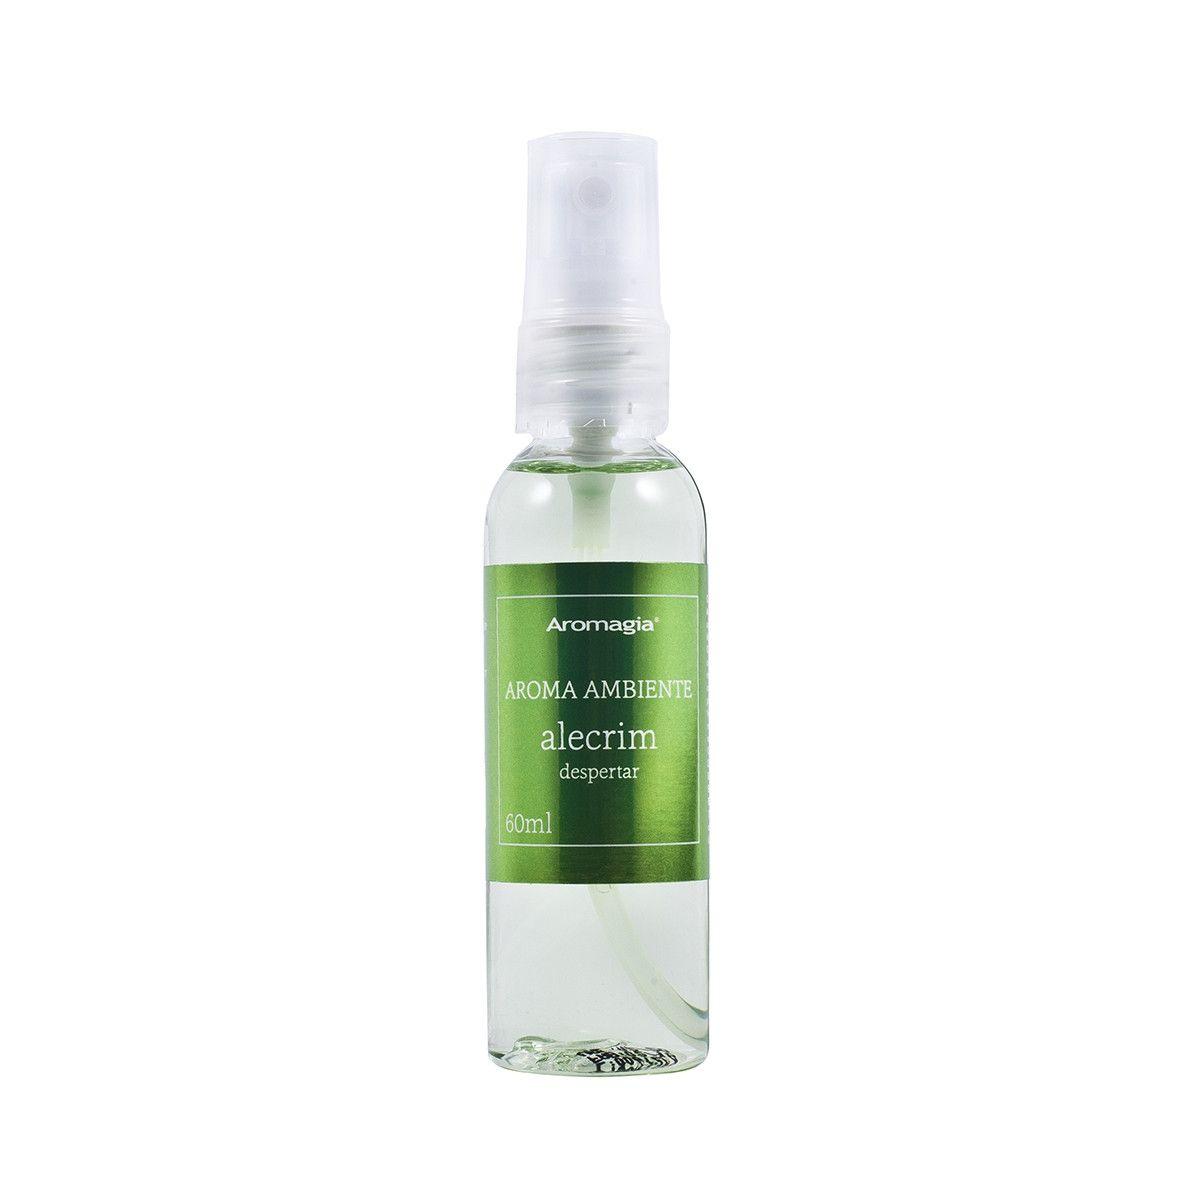 Spray de Ambiente Aromagia - Alecrim 60ml - WNF